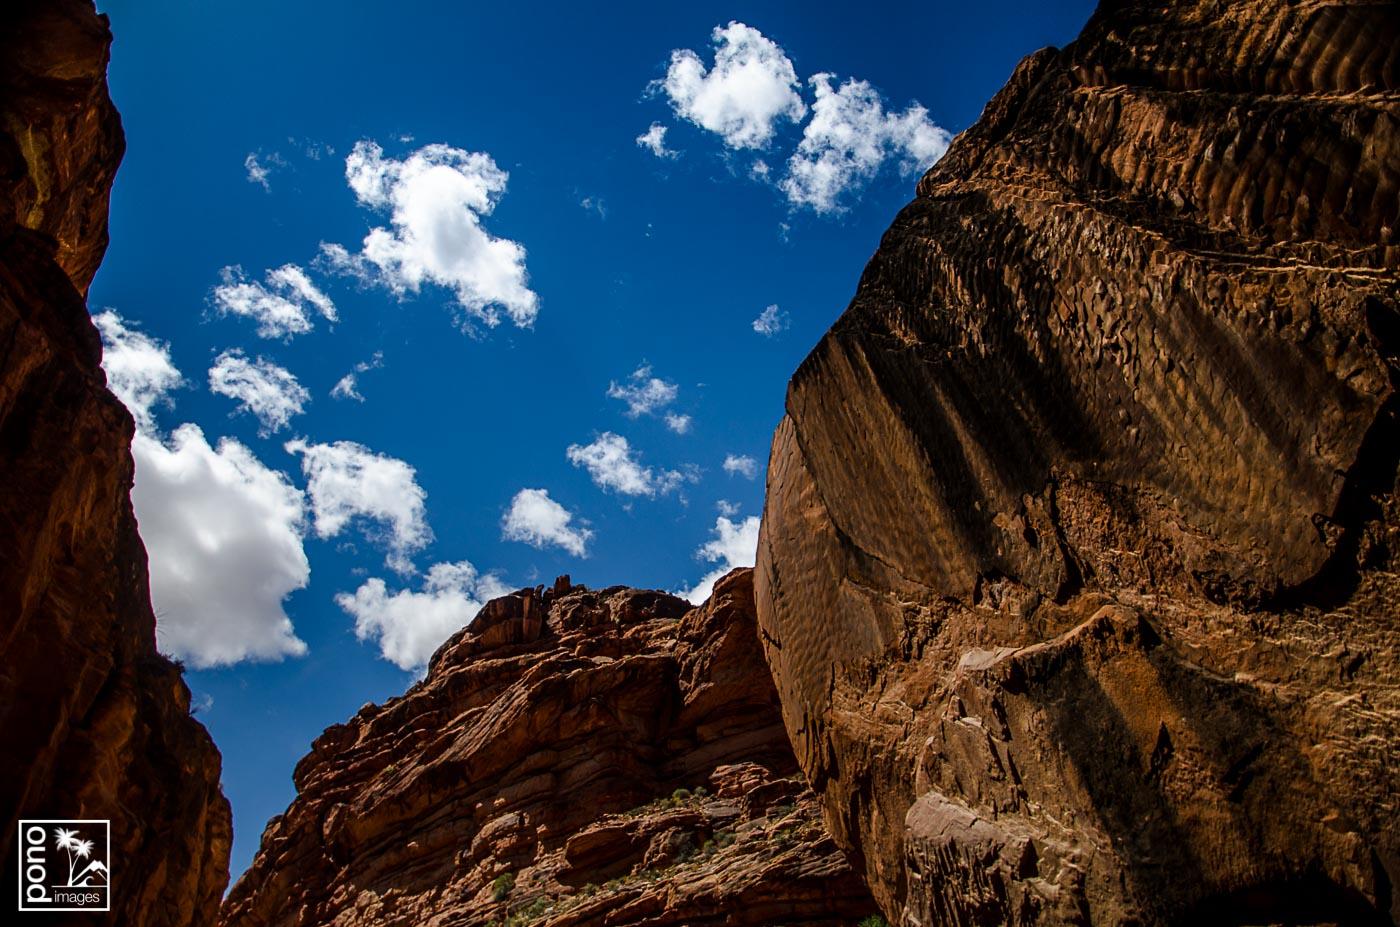 Havasu Canyon Clouds | Pono Images